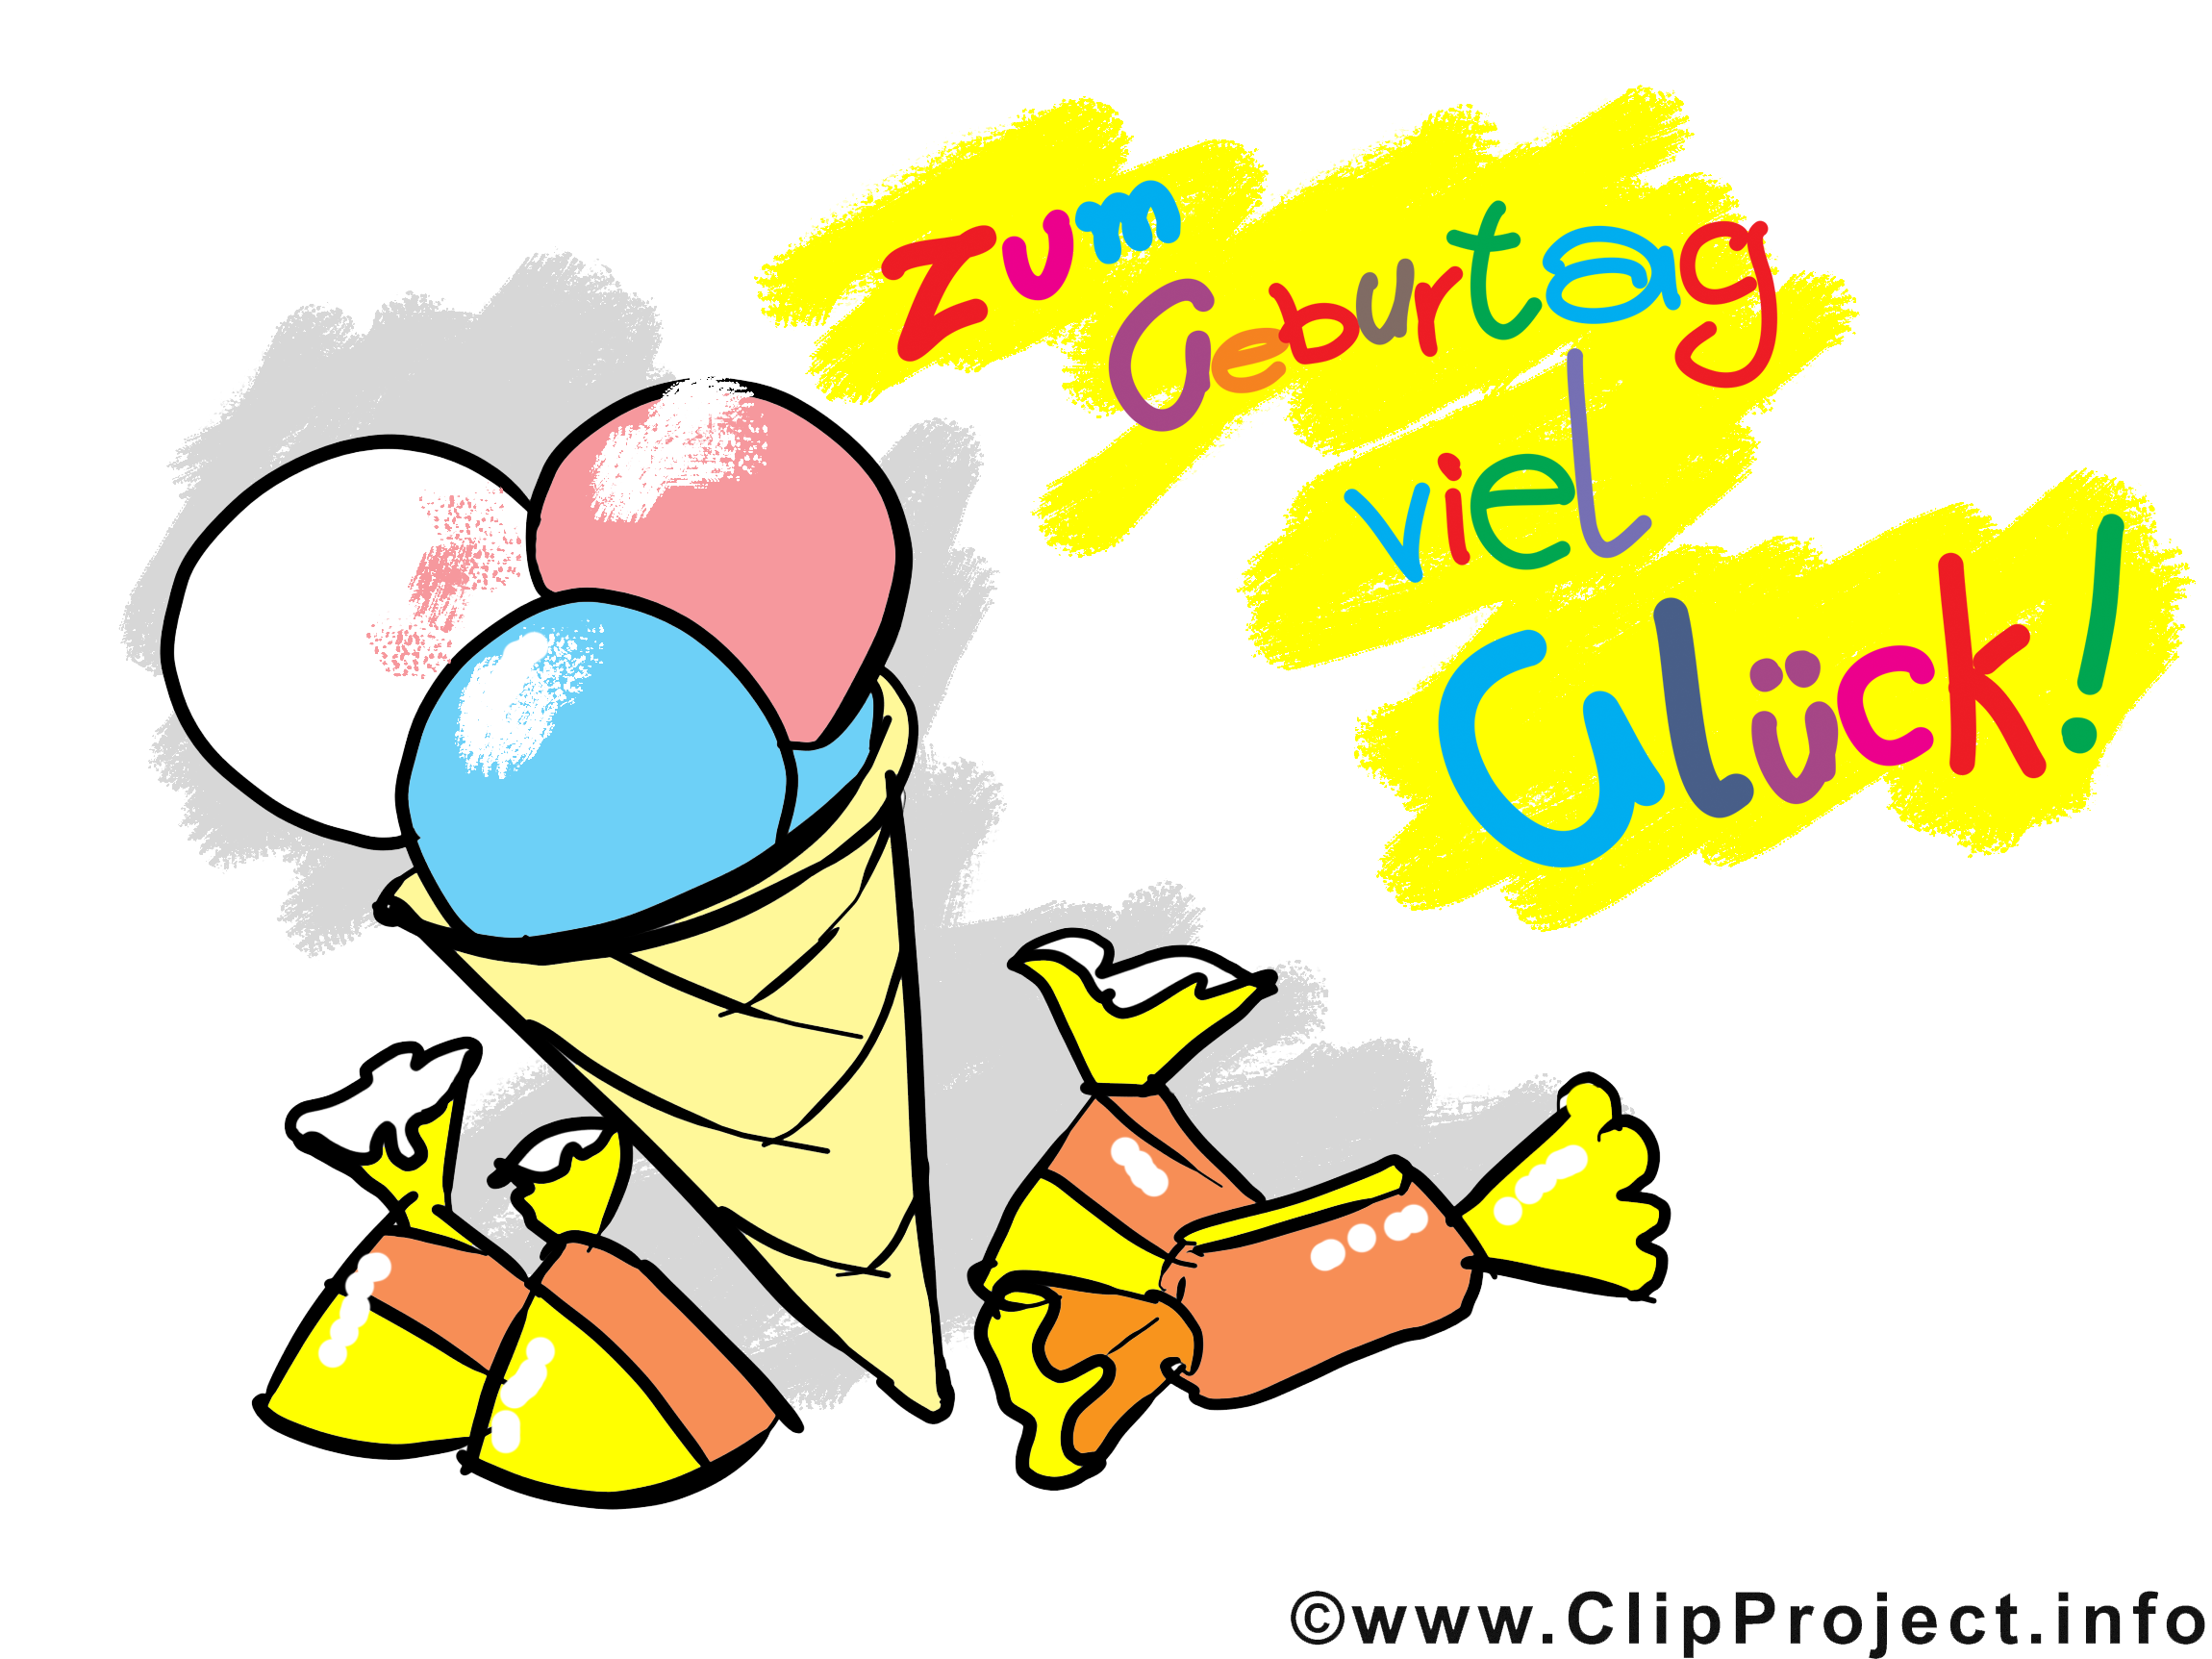 Alles gute clipart clipart free Alles gute clipart - ClipartFest clipart free